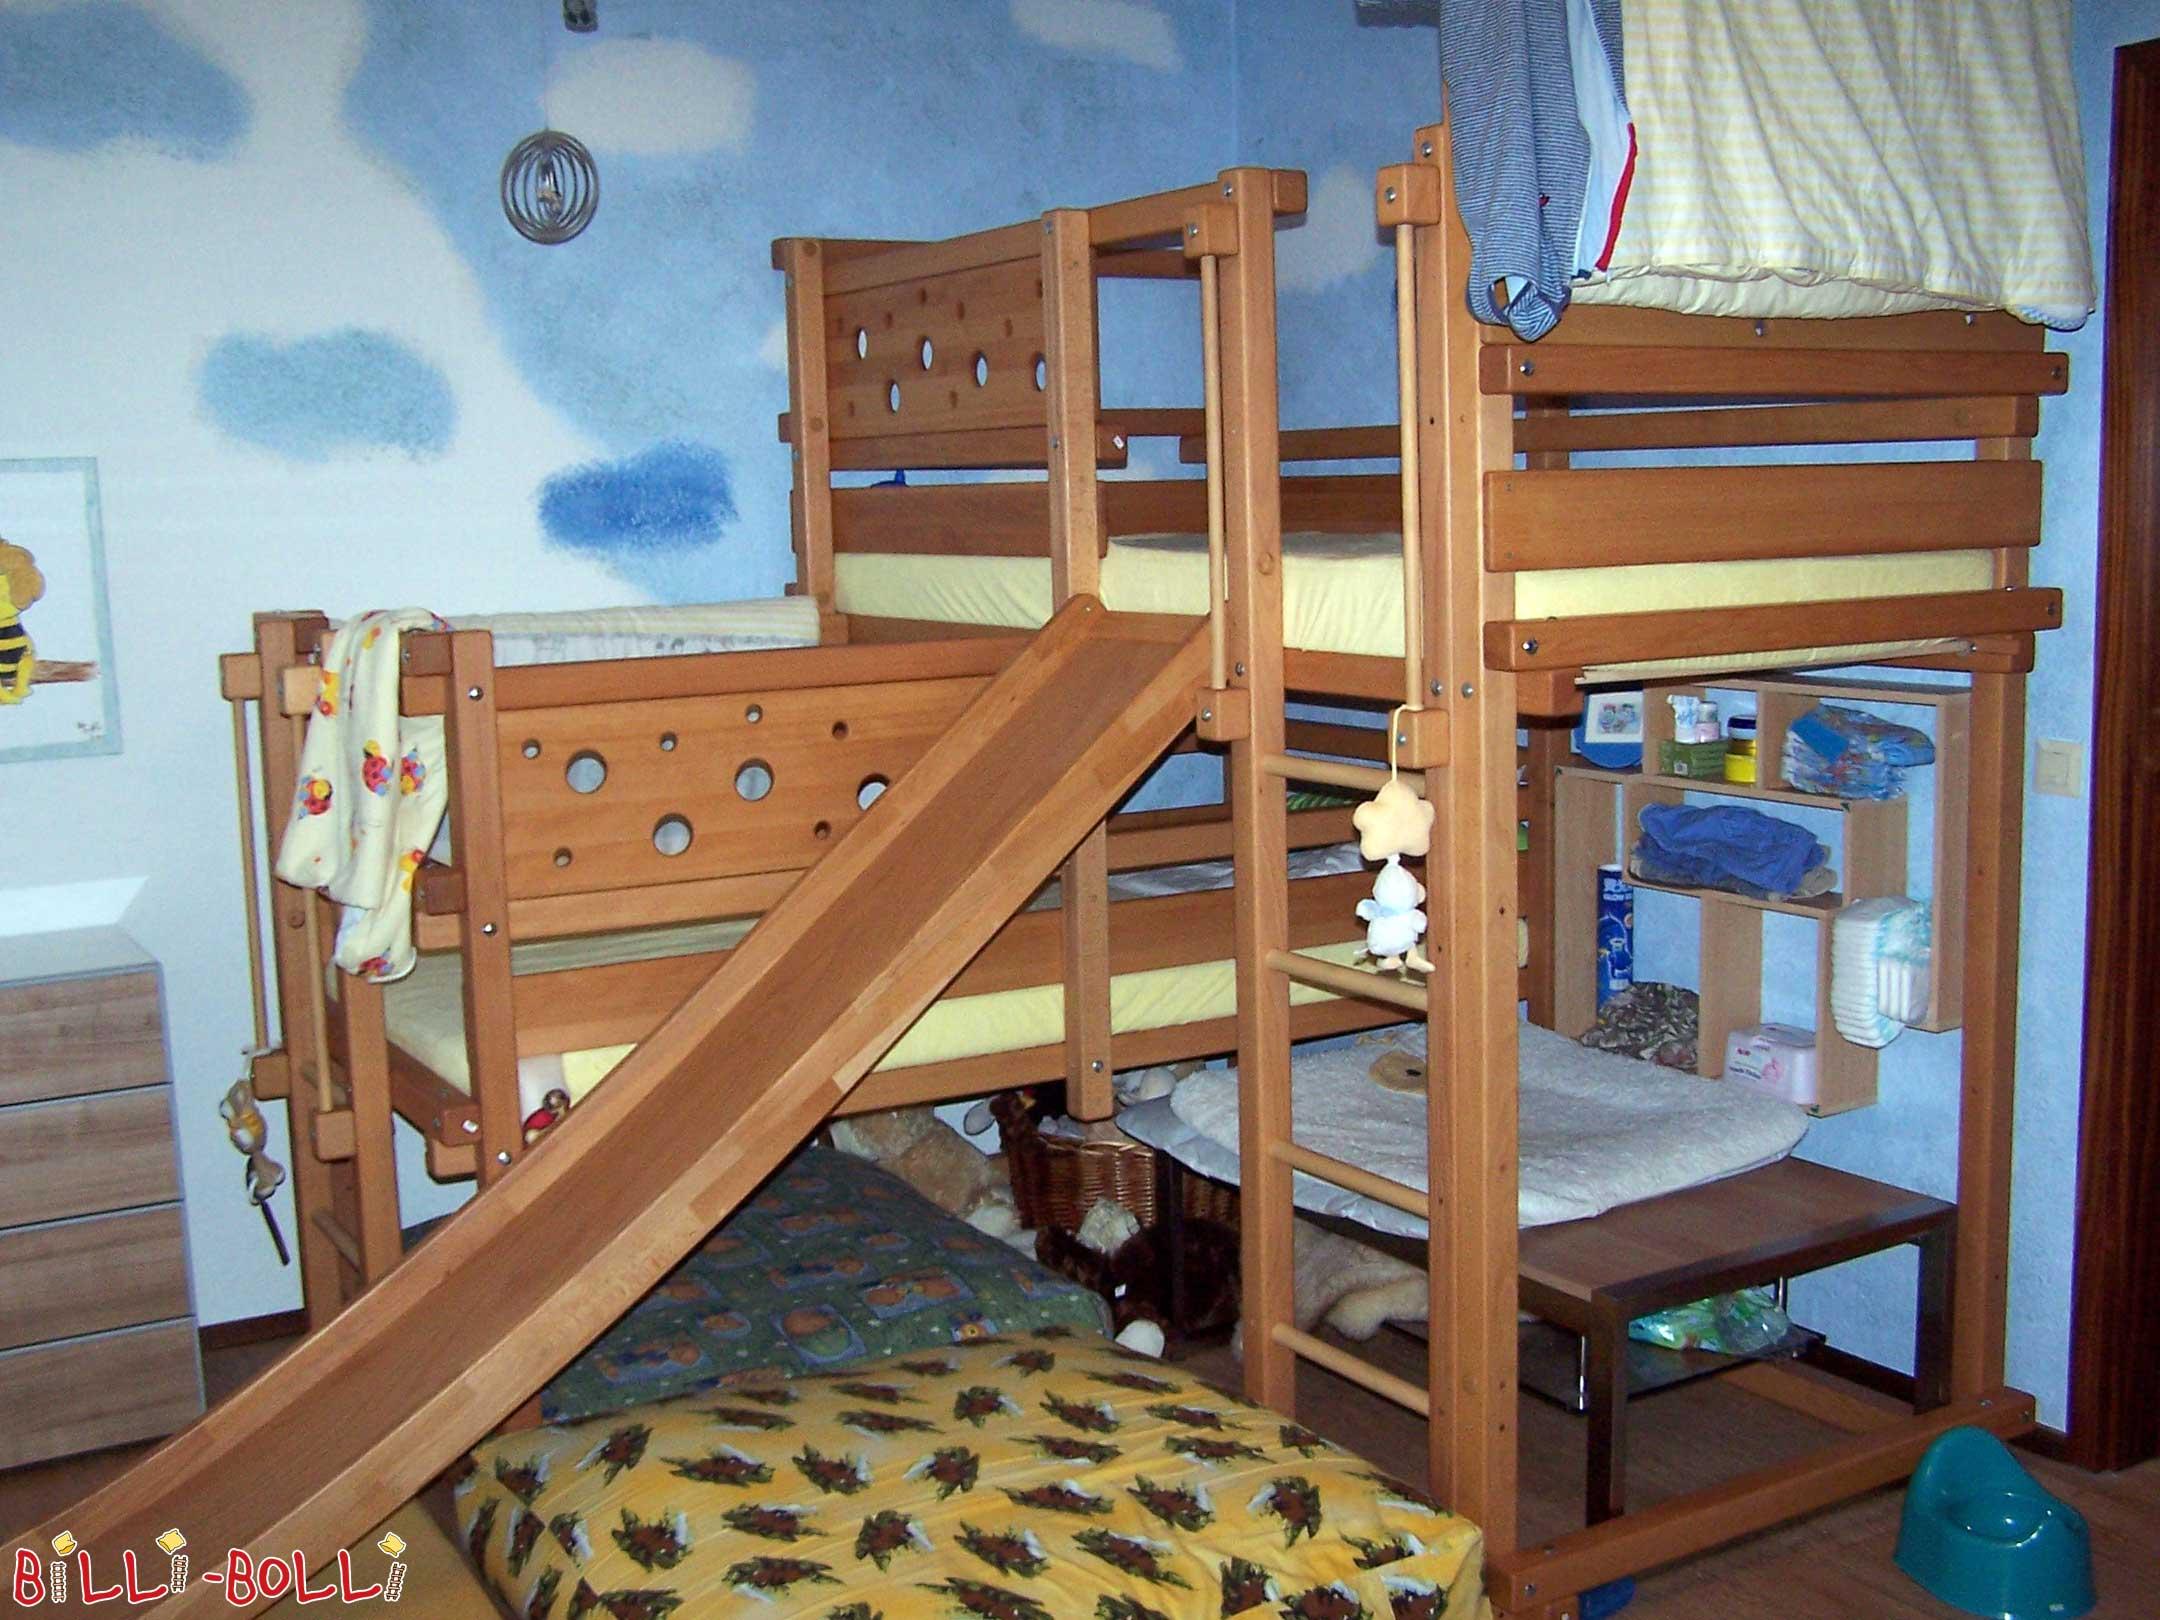 Etagenbett Dreier : Beide oben betten billi bolli kindermöbel